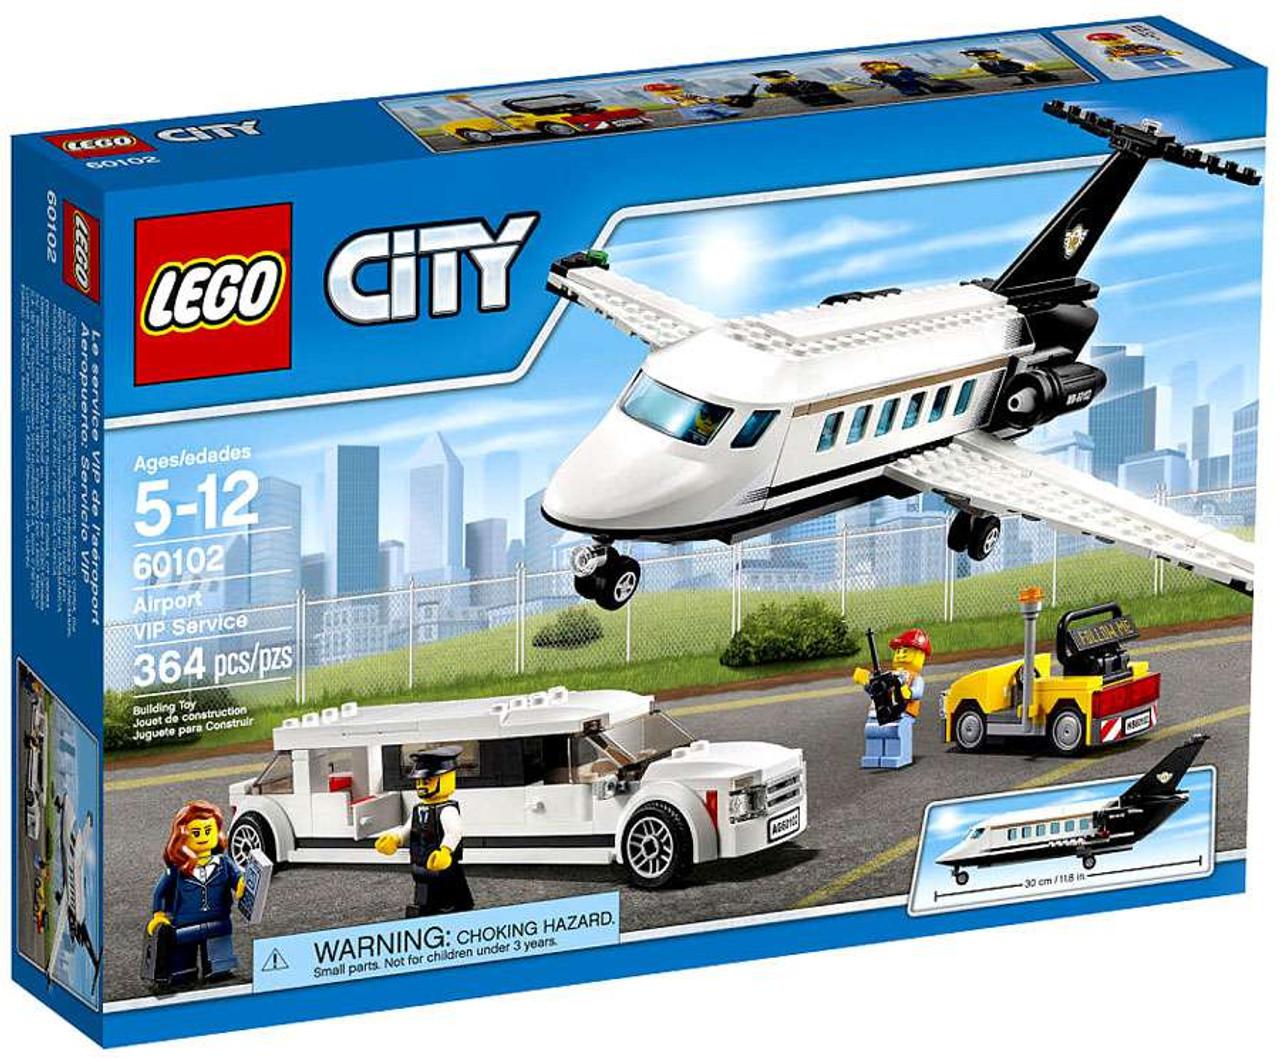 LEGO City Airport VIP Service Set 60102 - ToyWiz